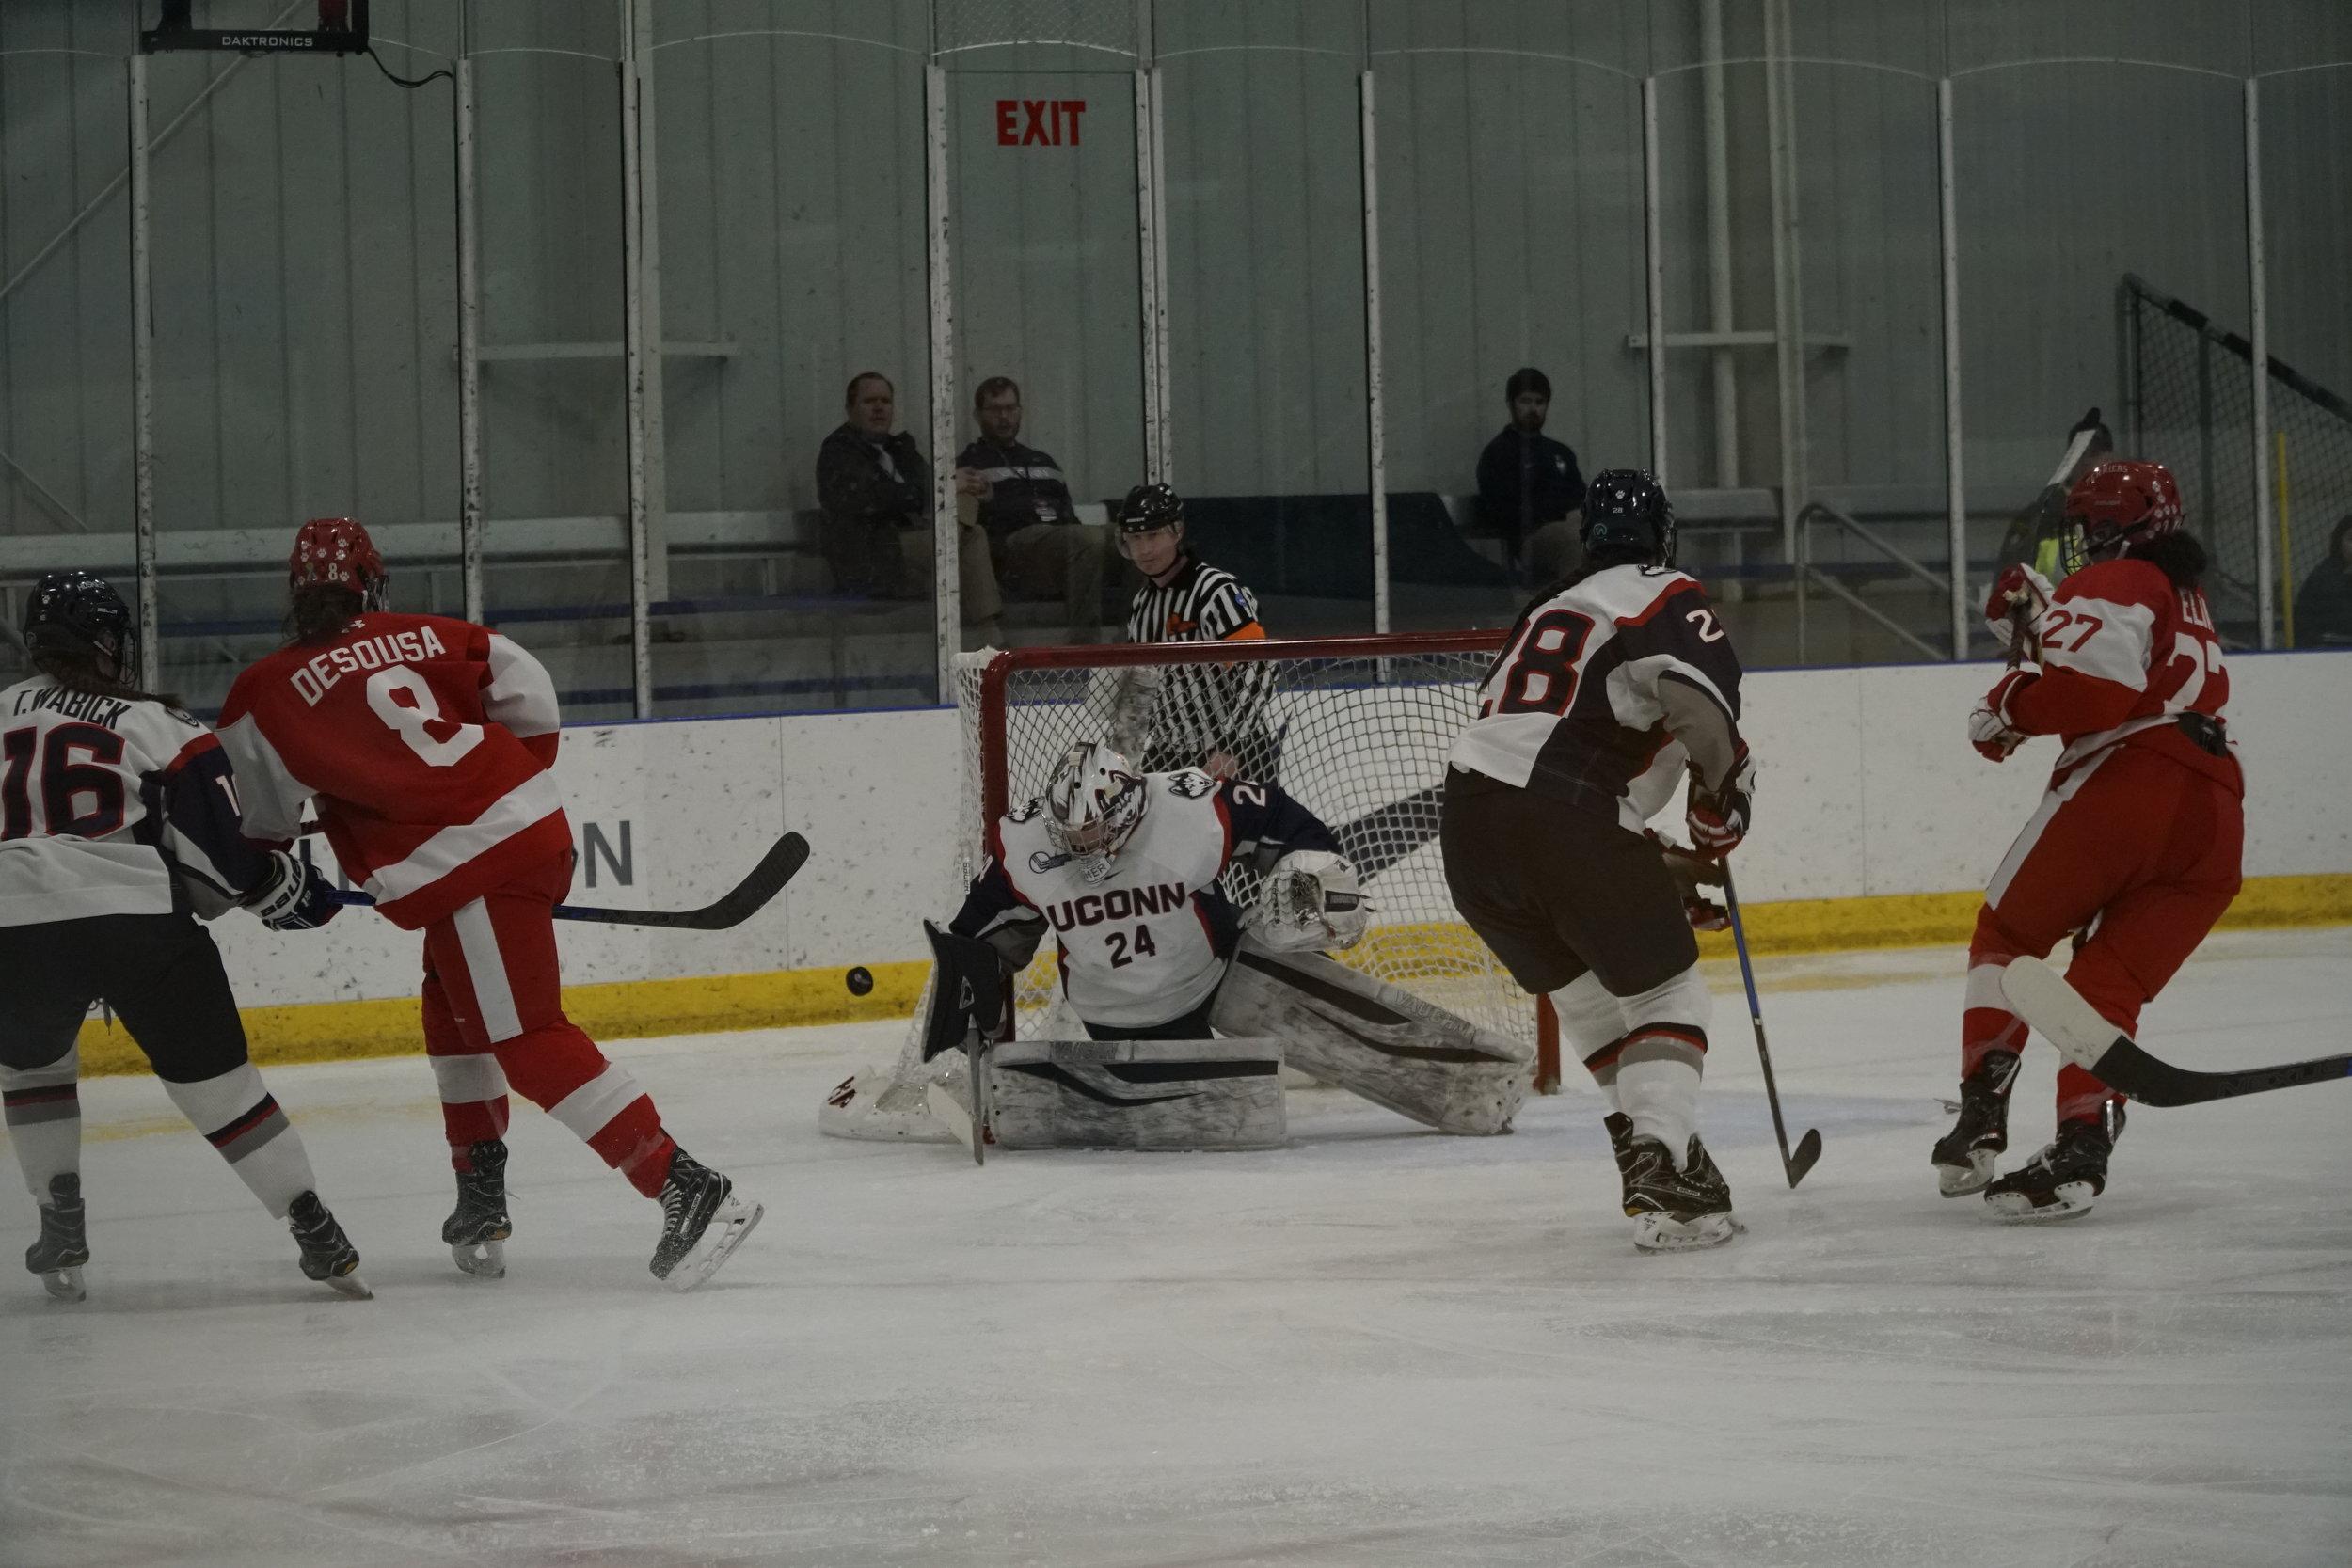 Women's Hockey: Huskies set to face BC in Hockey East quarterfinals